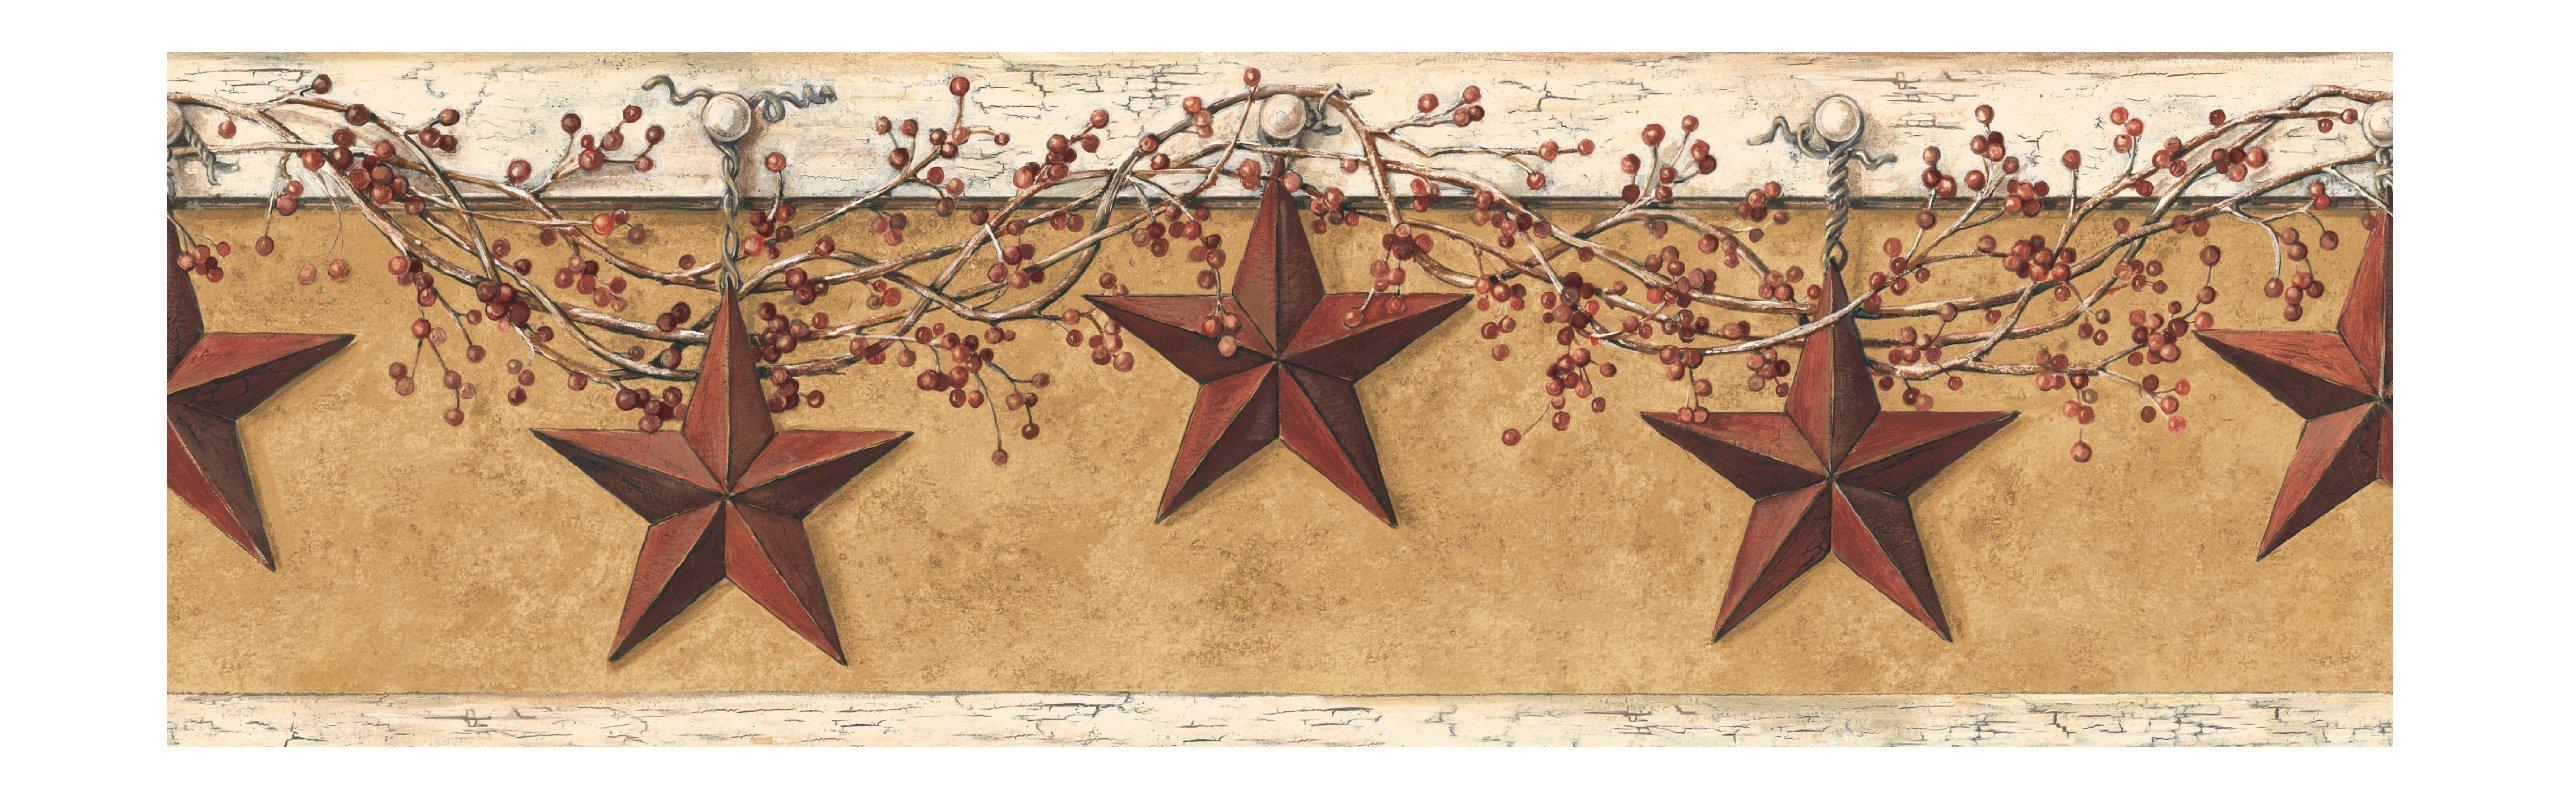 York Wallcoverings HK4663BDSMP Best Of Country Hanging Star 8-Inch x 10-Inch Wallpaper Border Memo Sample, Mustard/Cream